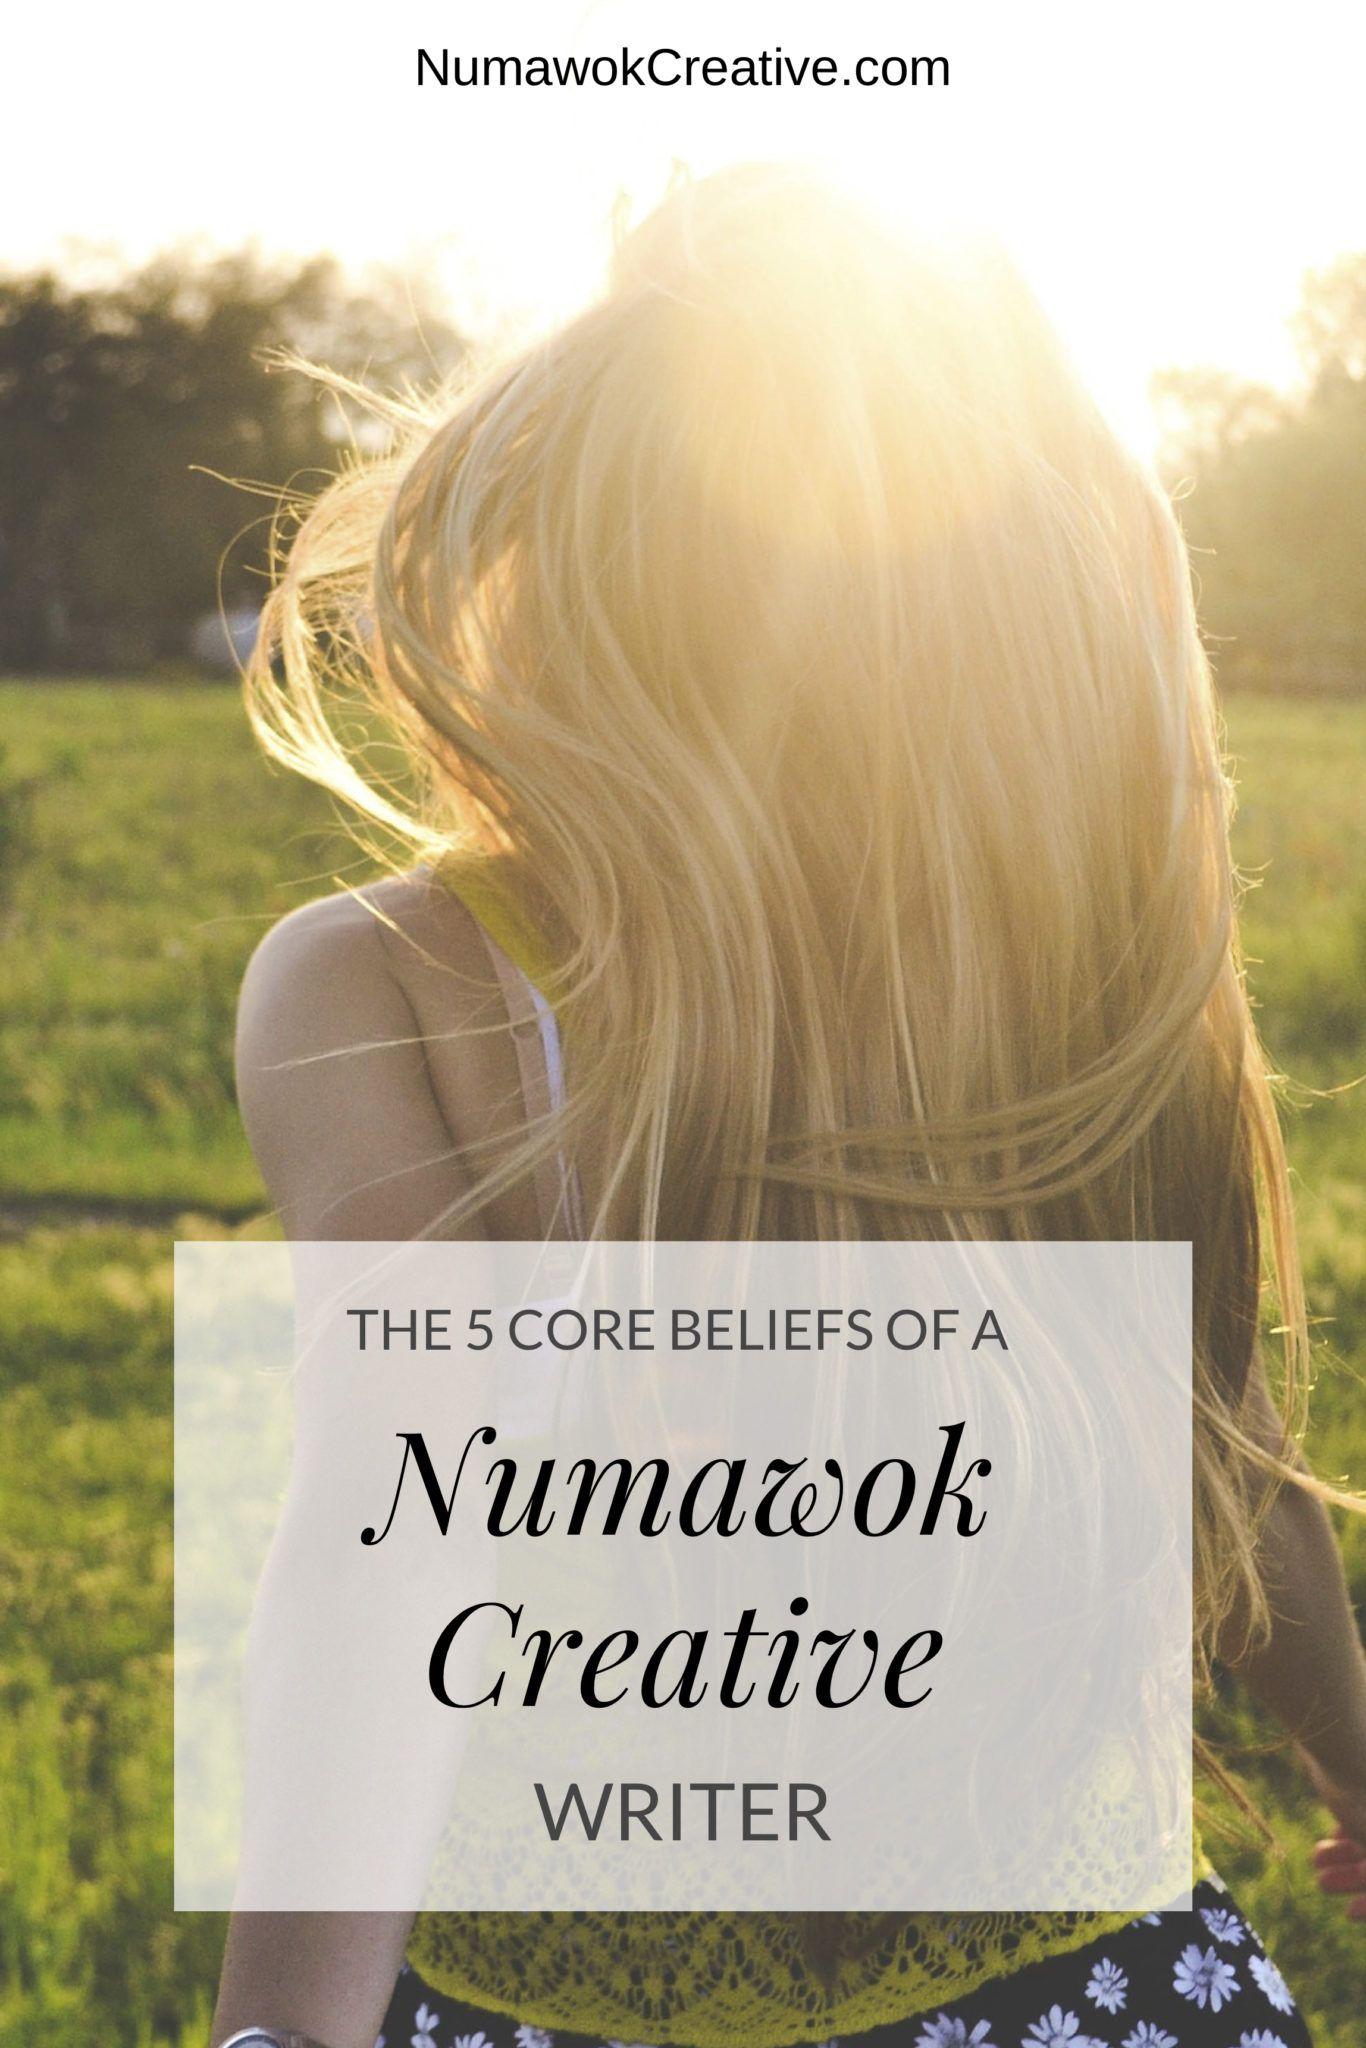 The 5 Core Beliefs Of A Numawok Creative Writer